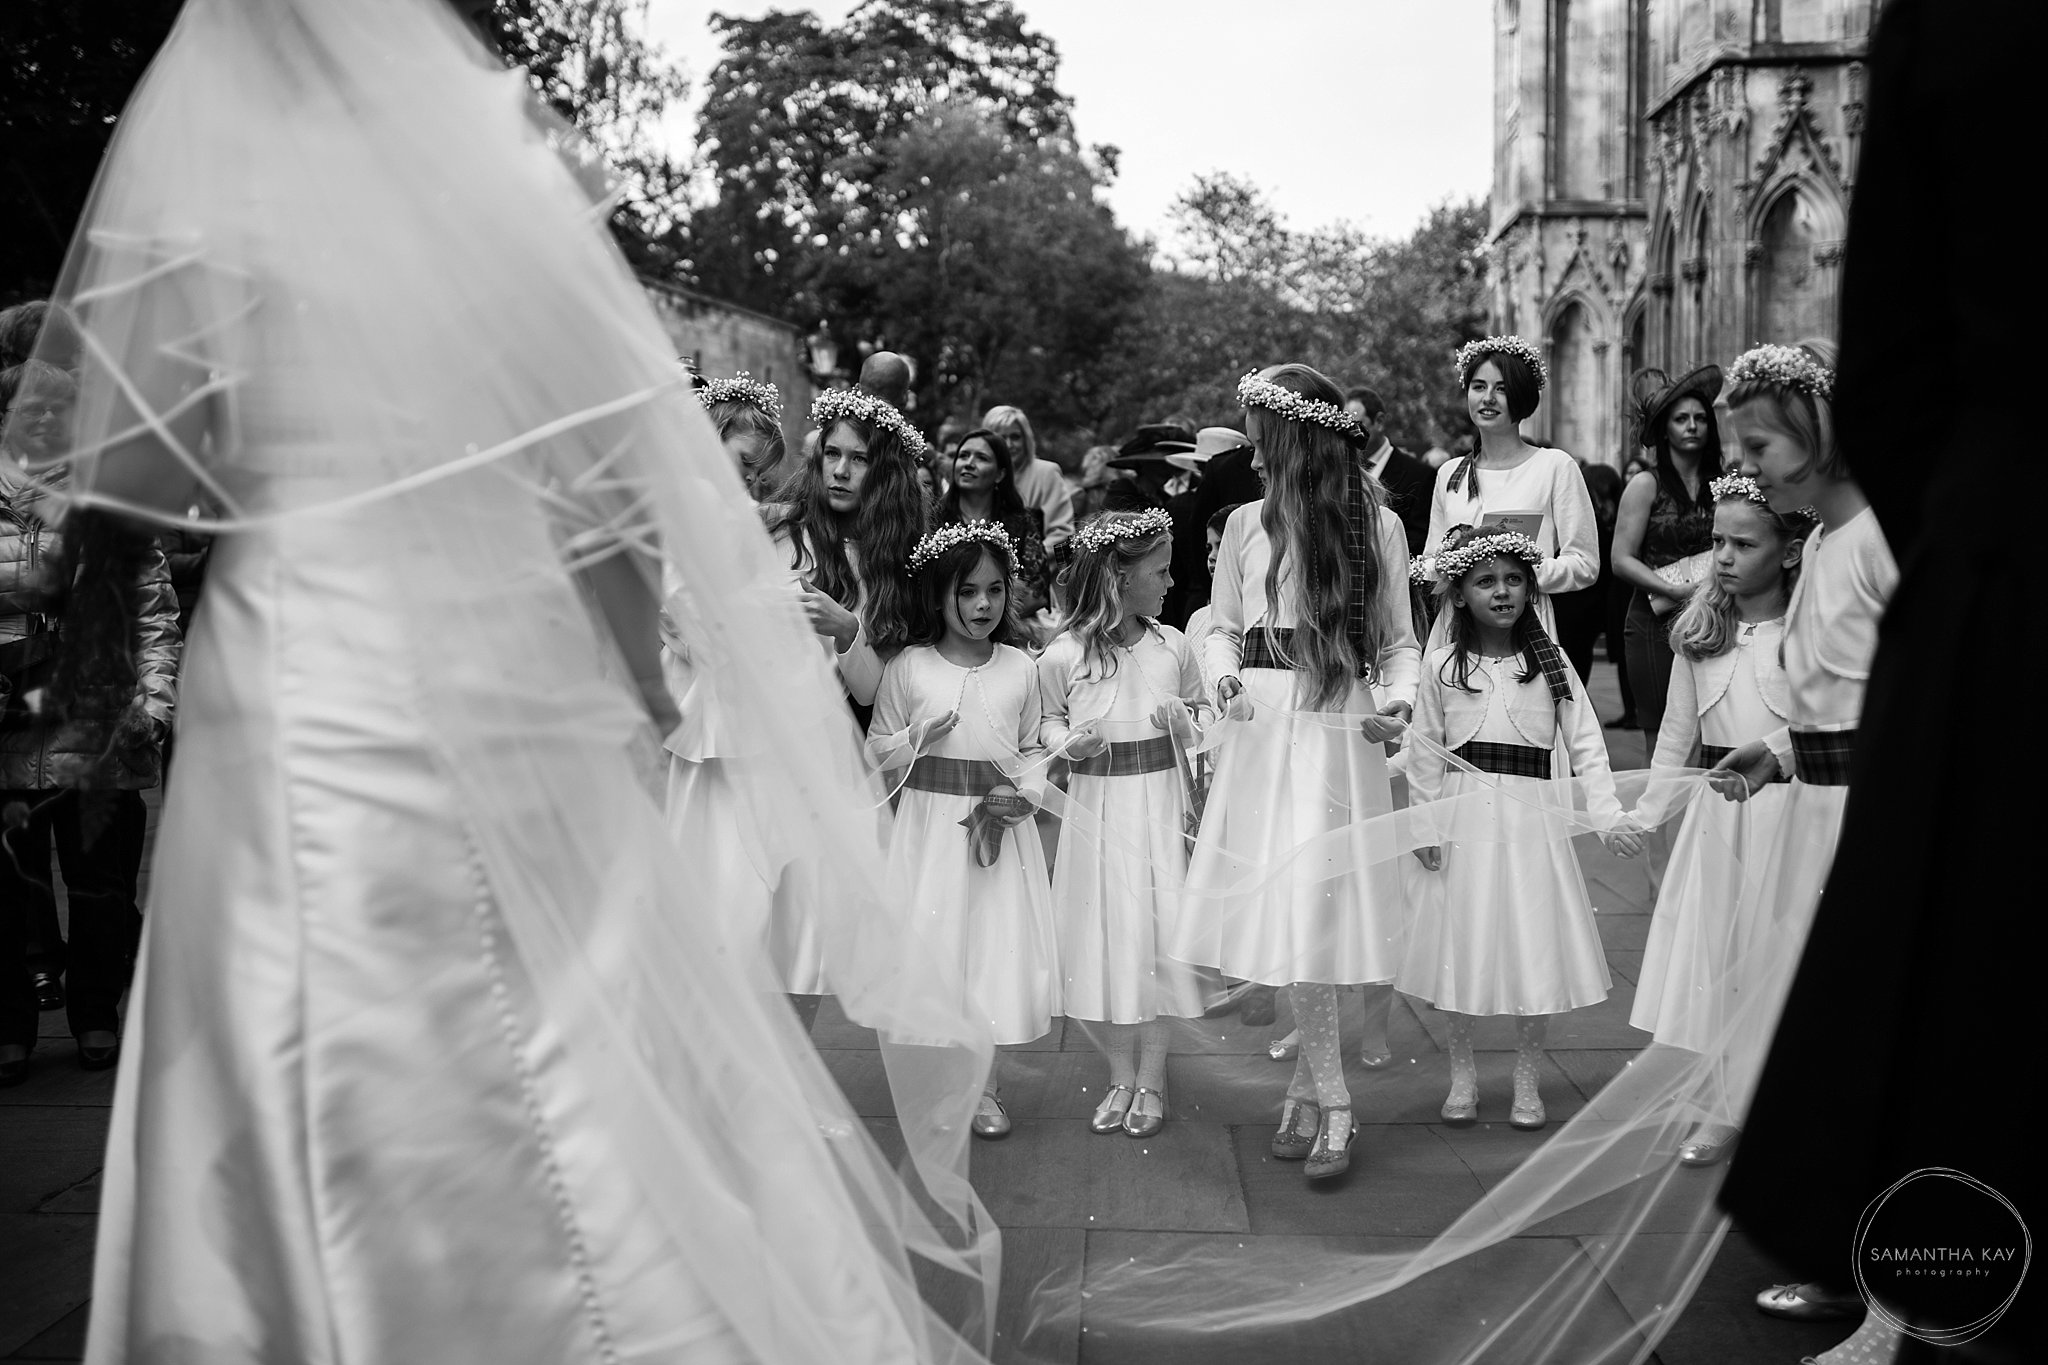 Black and white wedding photogrpahy